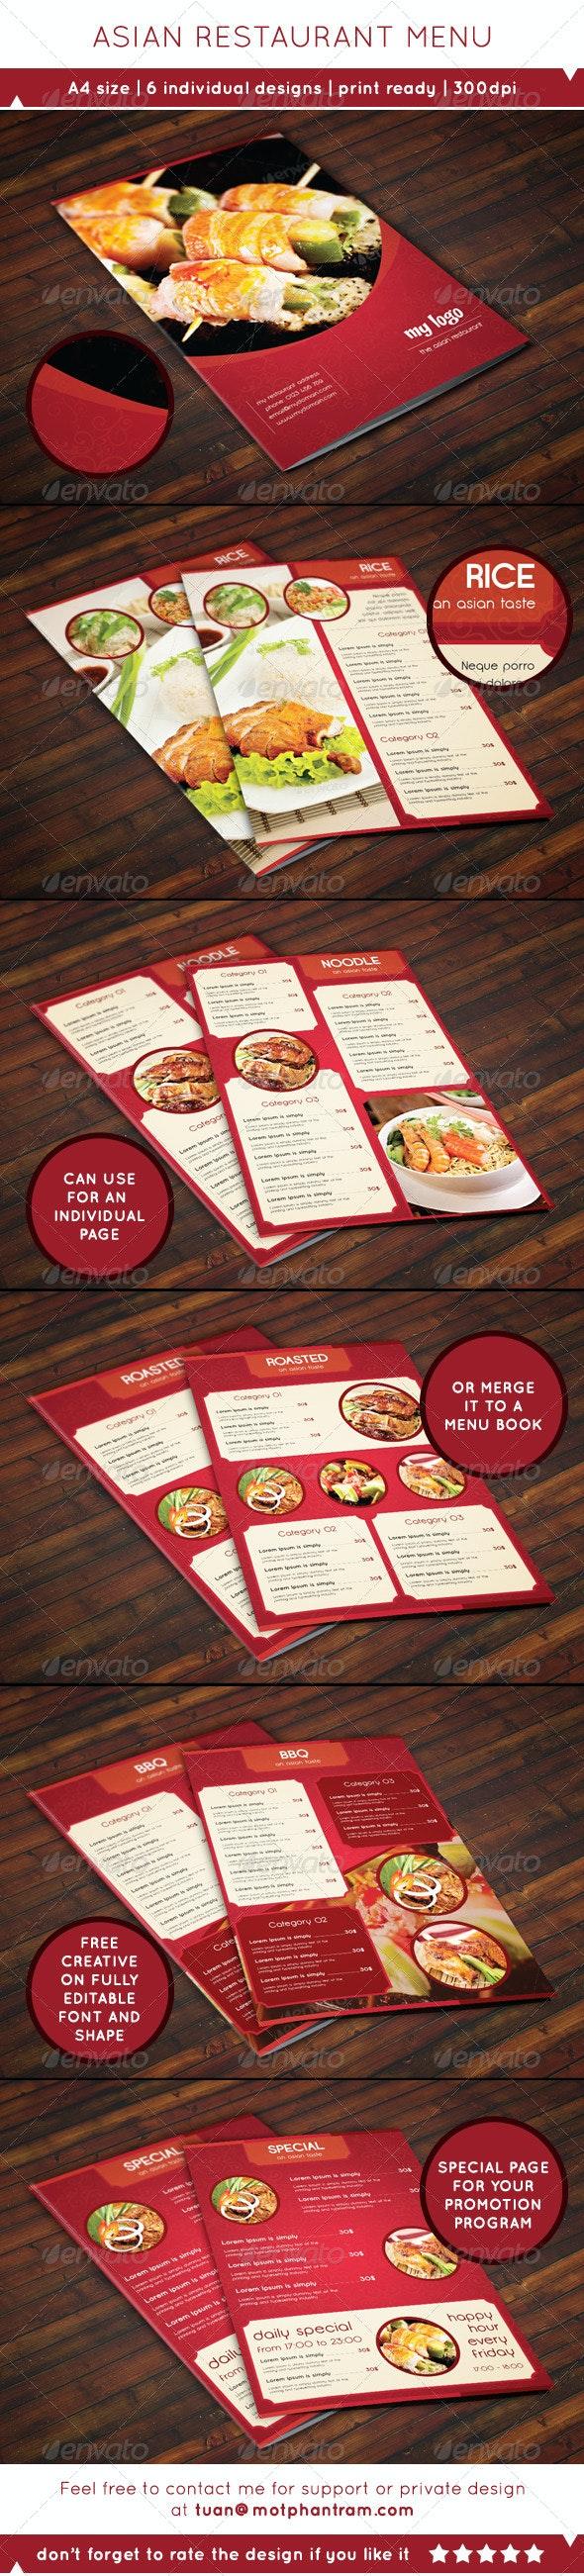 A4 Asian Style Food Menu - Food Menus Print Templates